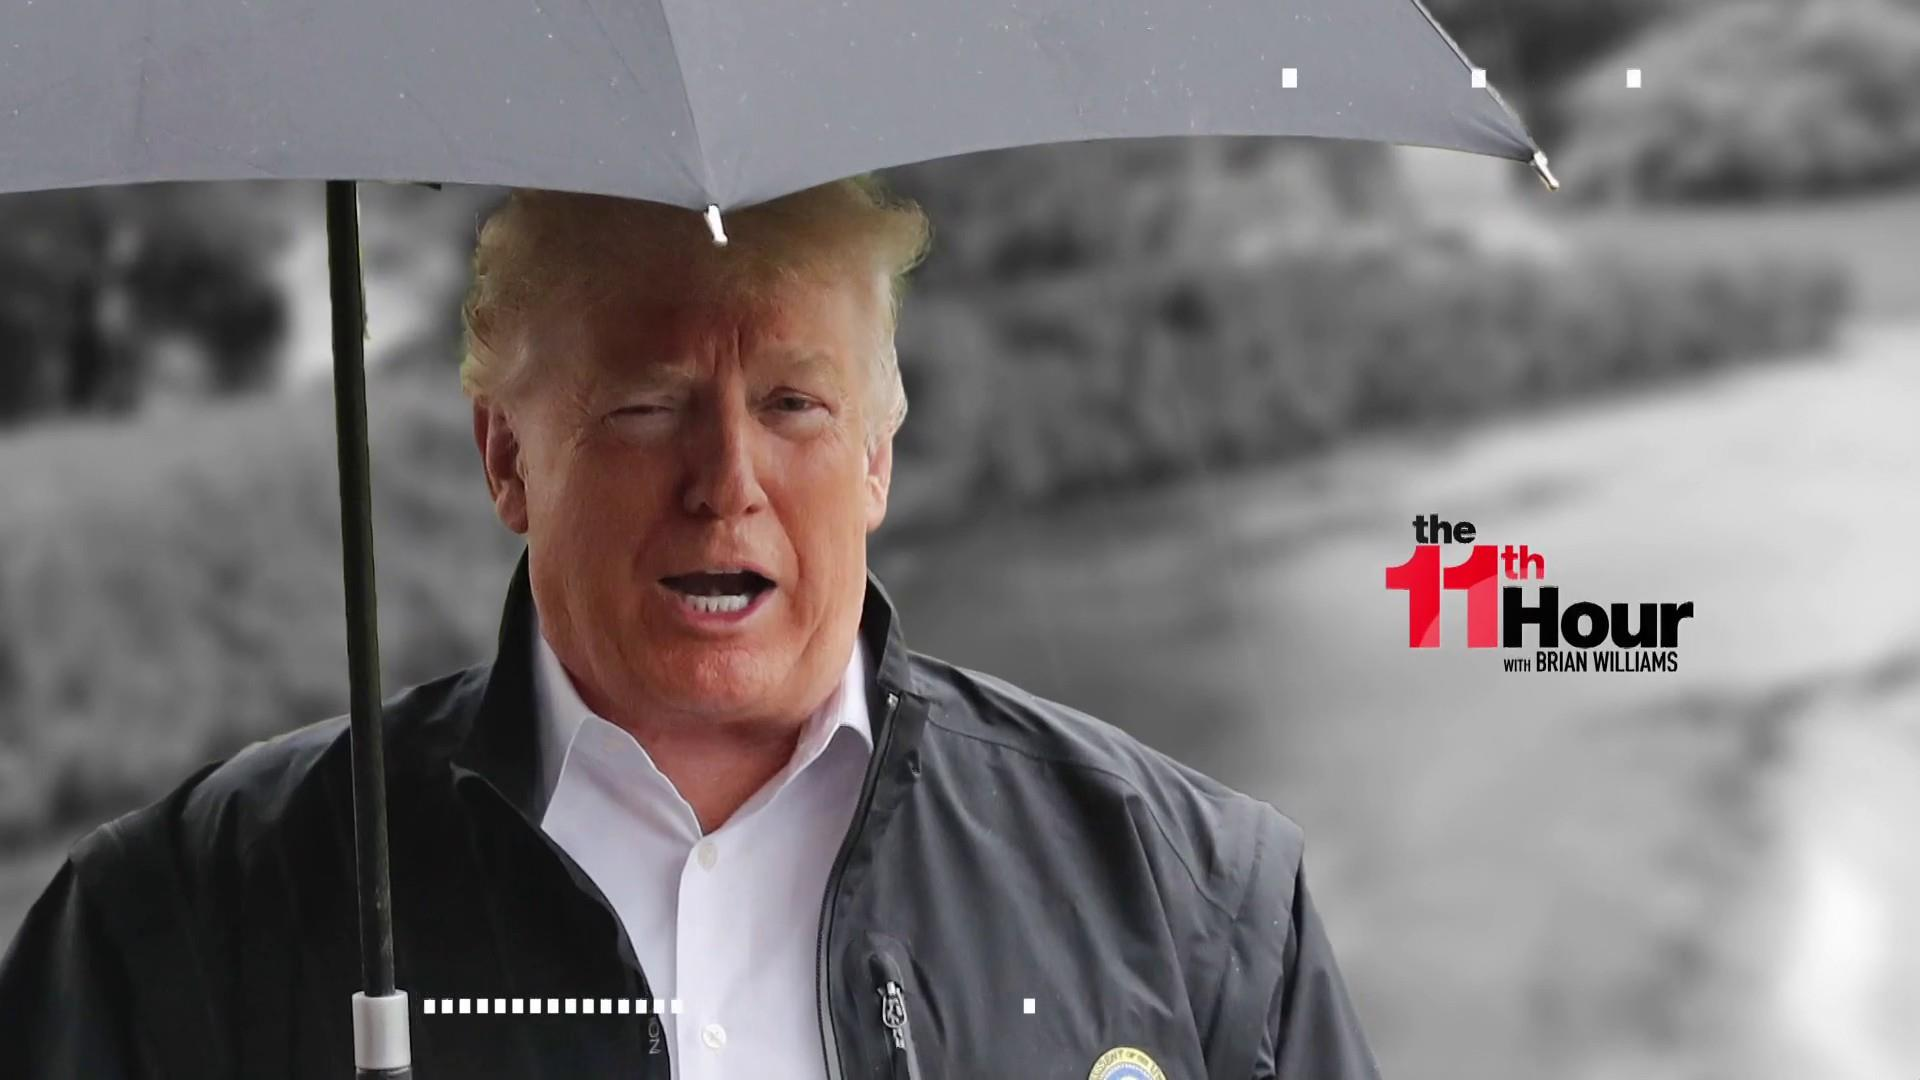 Trump on mocking Dr. Blasey Ford: 'It doesn't matter. We won.'